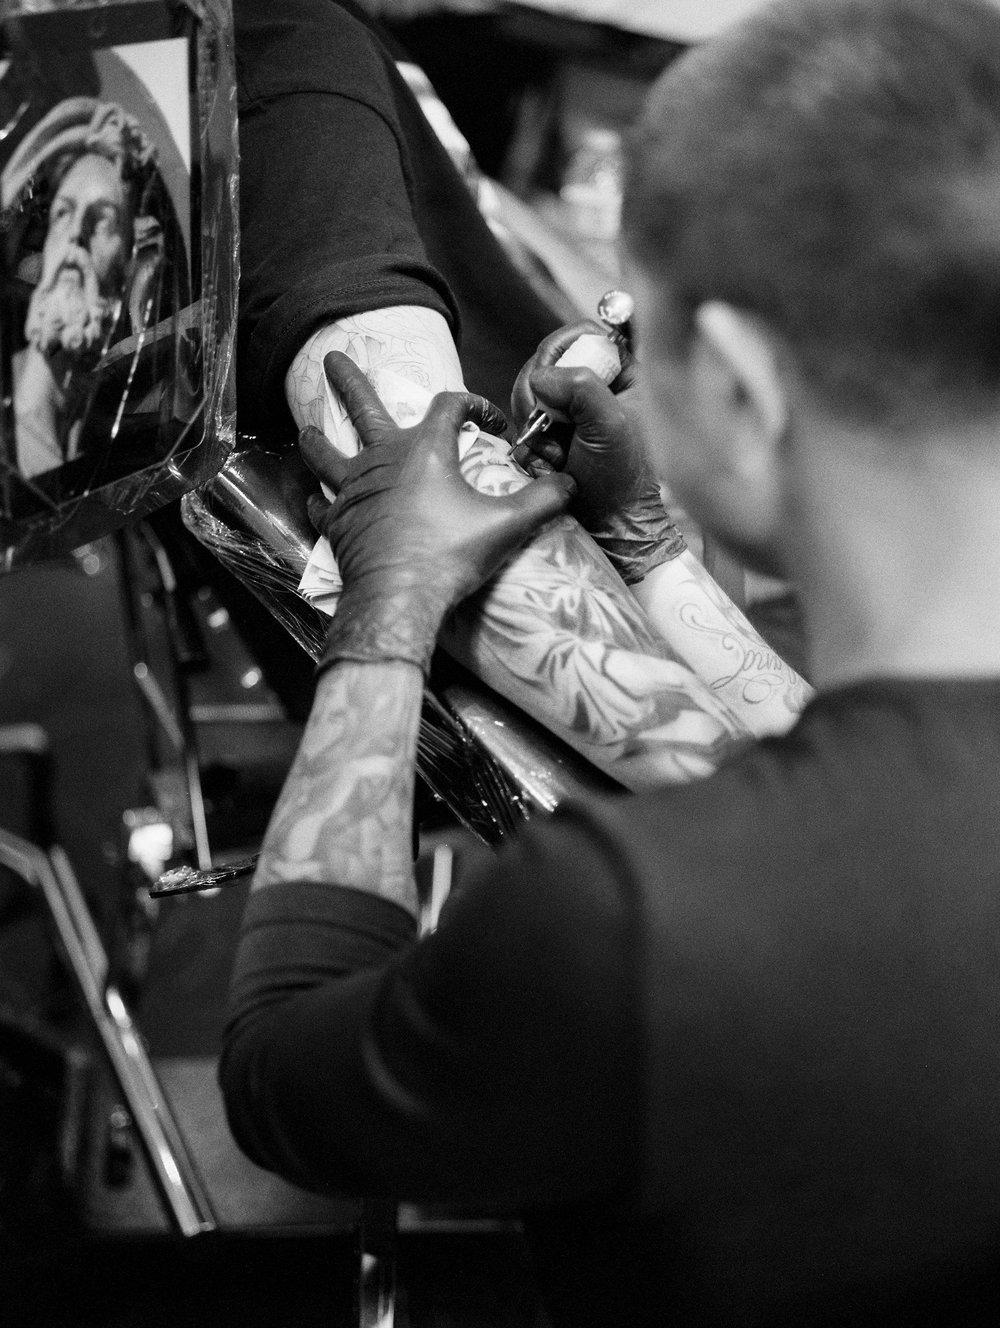 stephen-tattoo (2 of 2).jpg